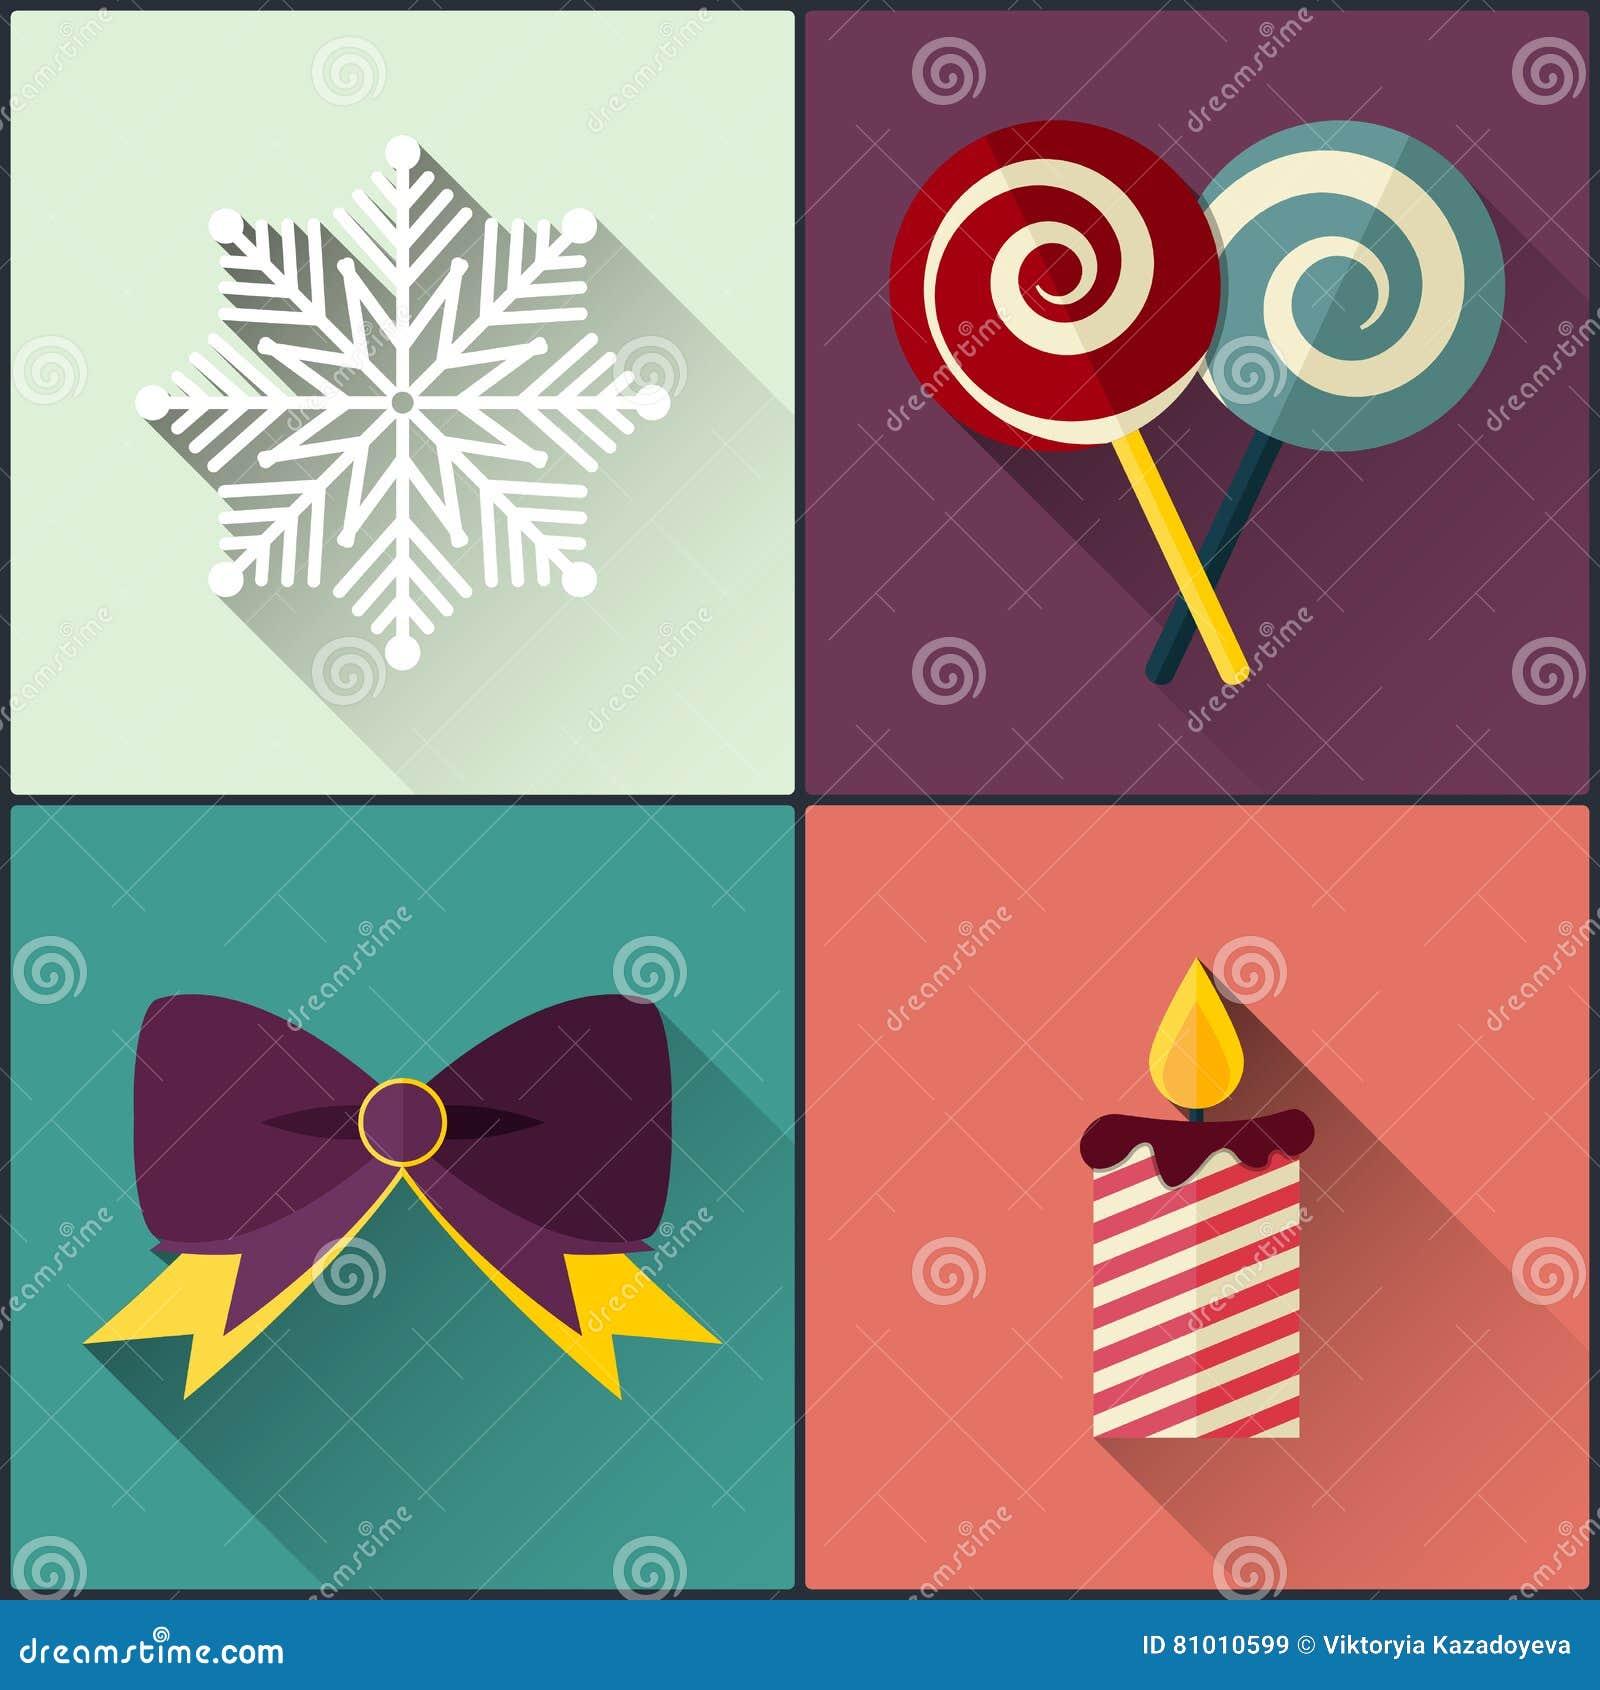 lollipop icon pack